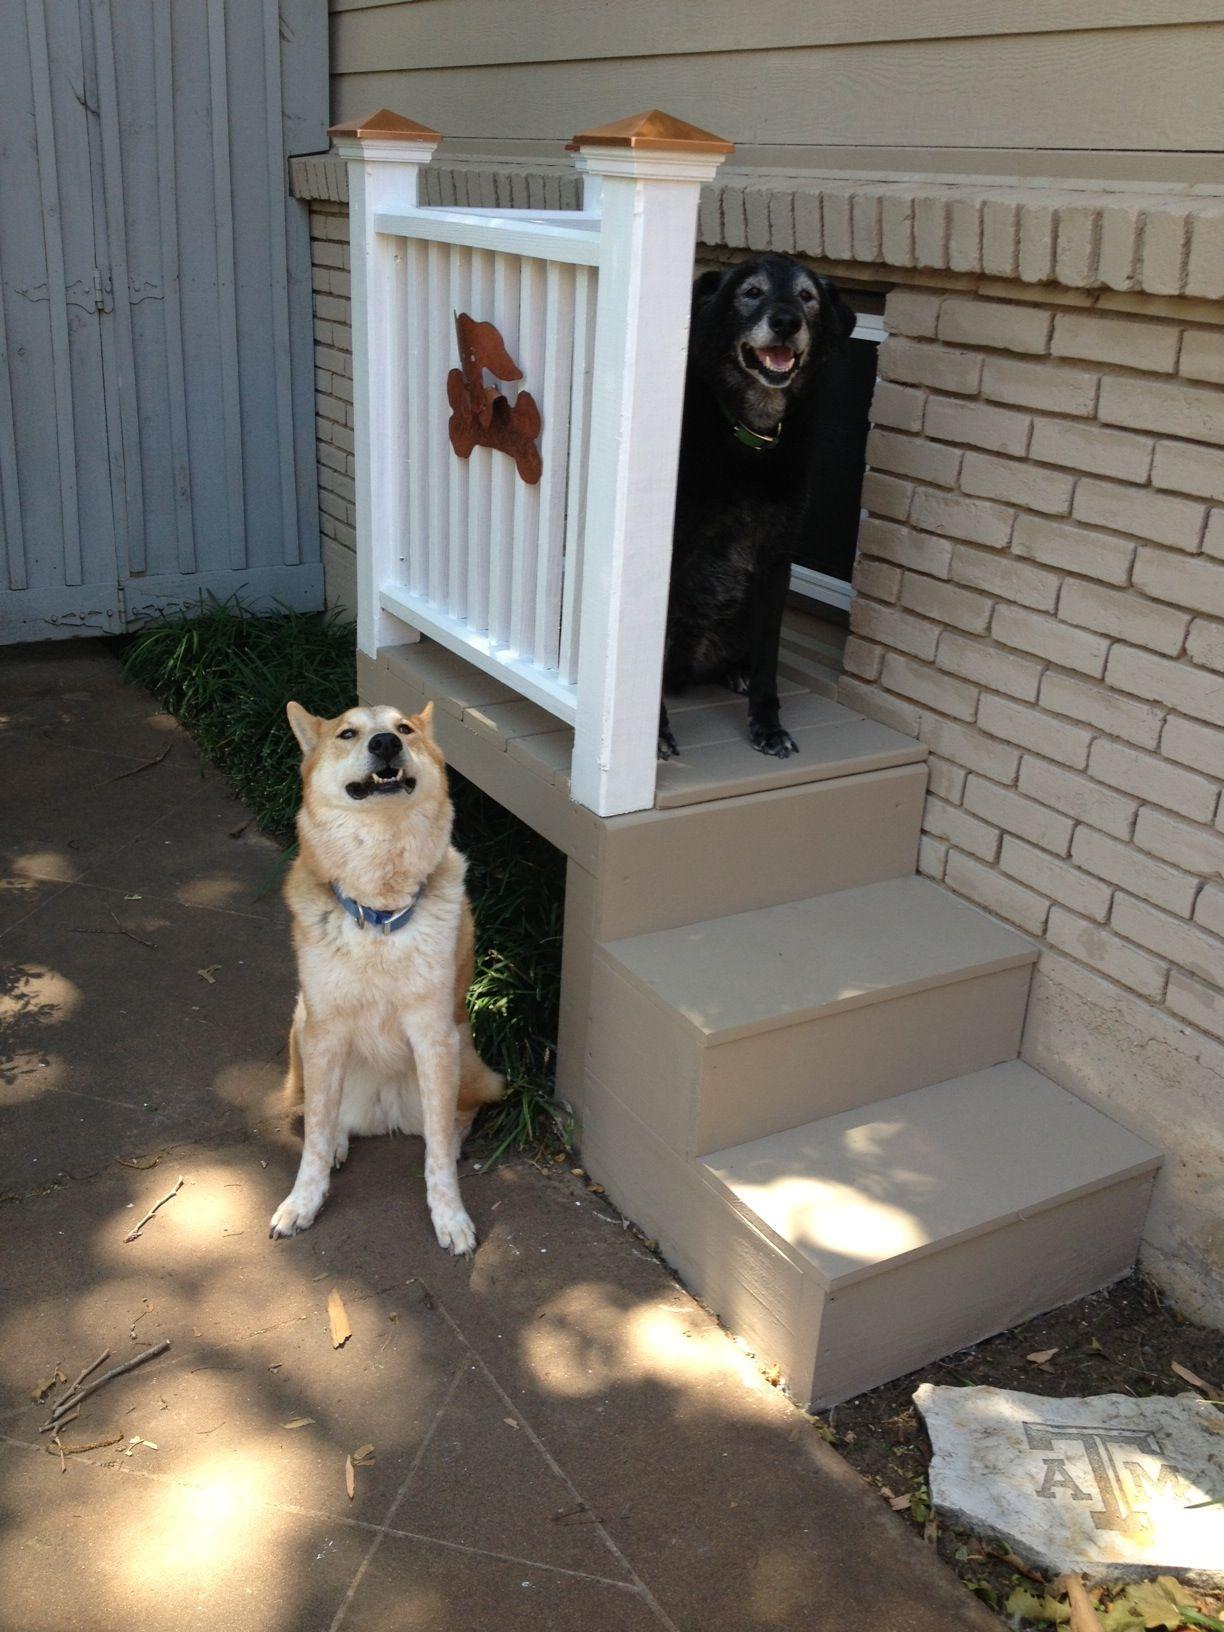 diy dog doors. To Solver Our Dog Door Dilemma At Pier And Beam House, We Made This Diy Doors